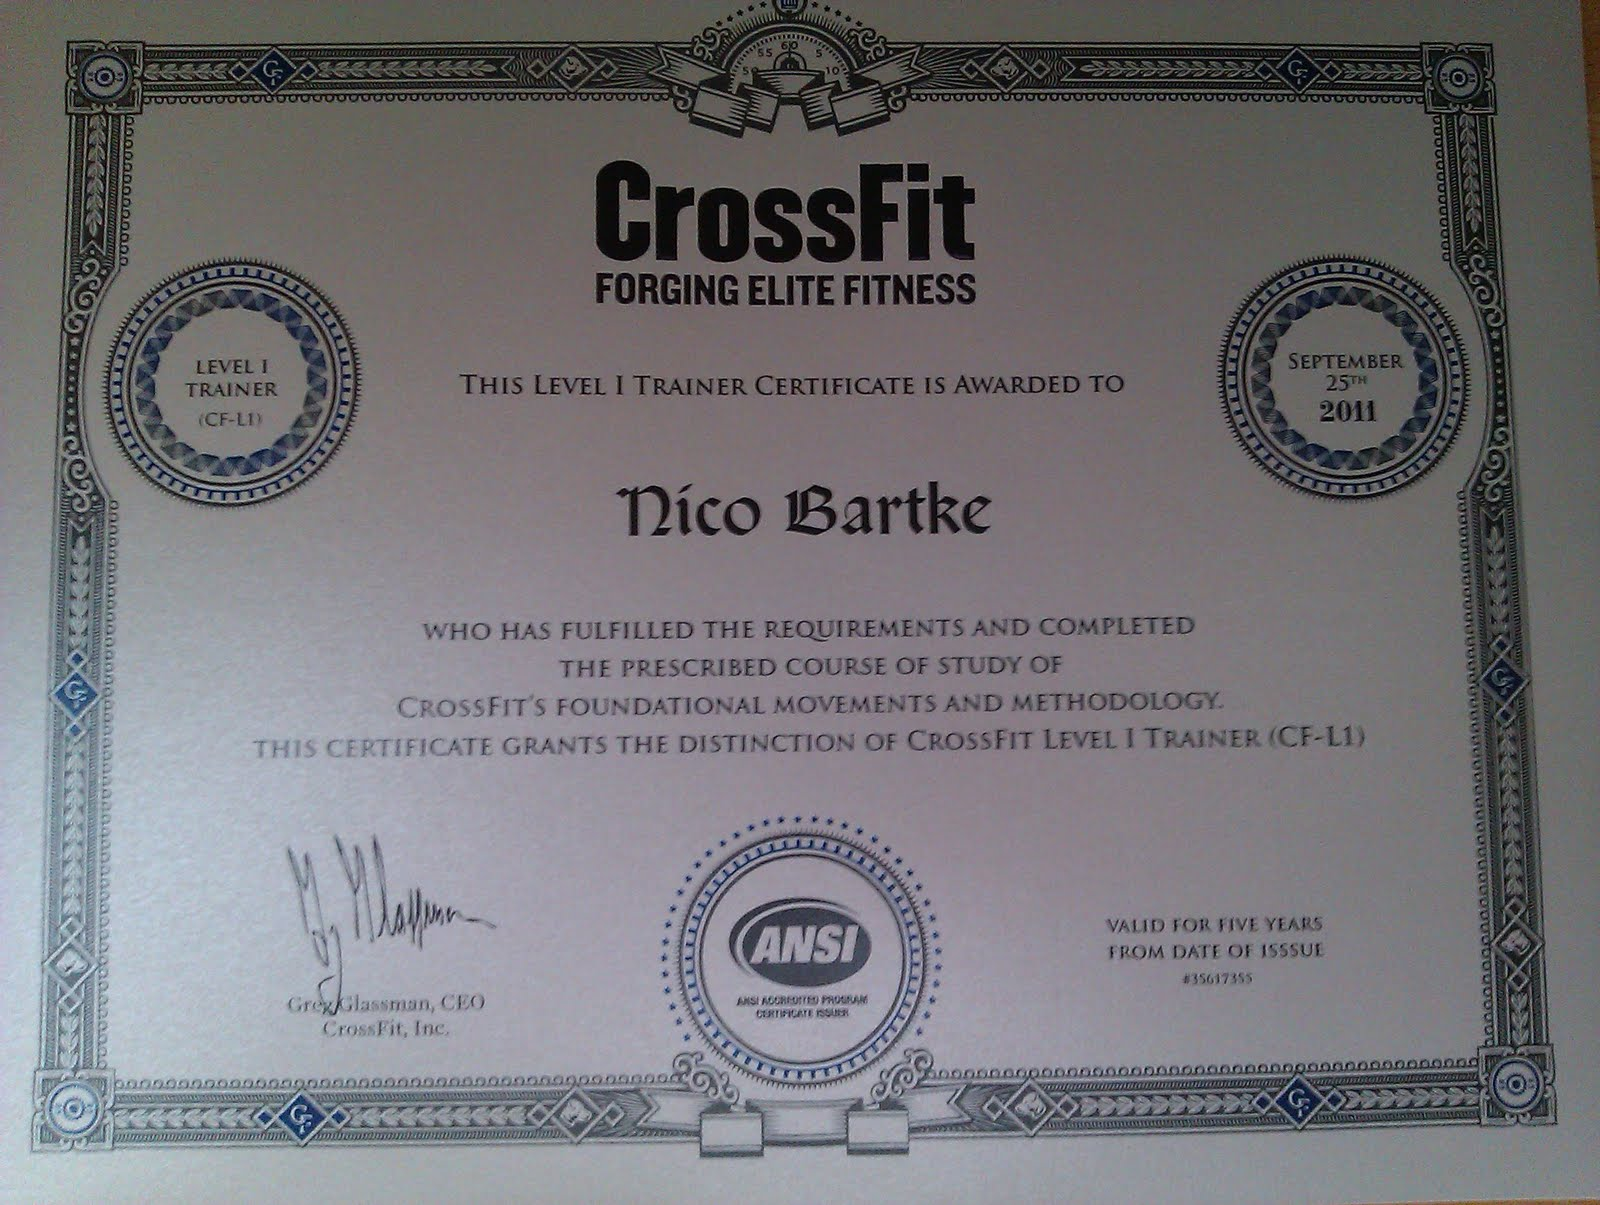 crossfit certificate level trainer ansi